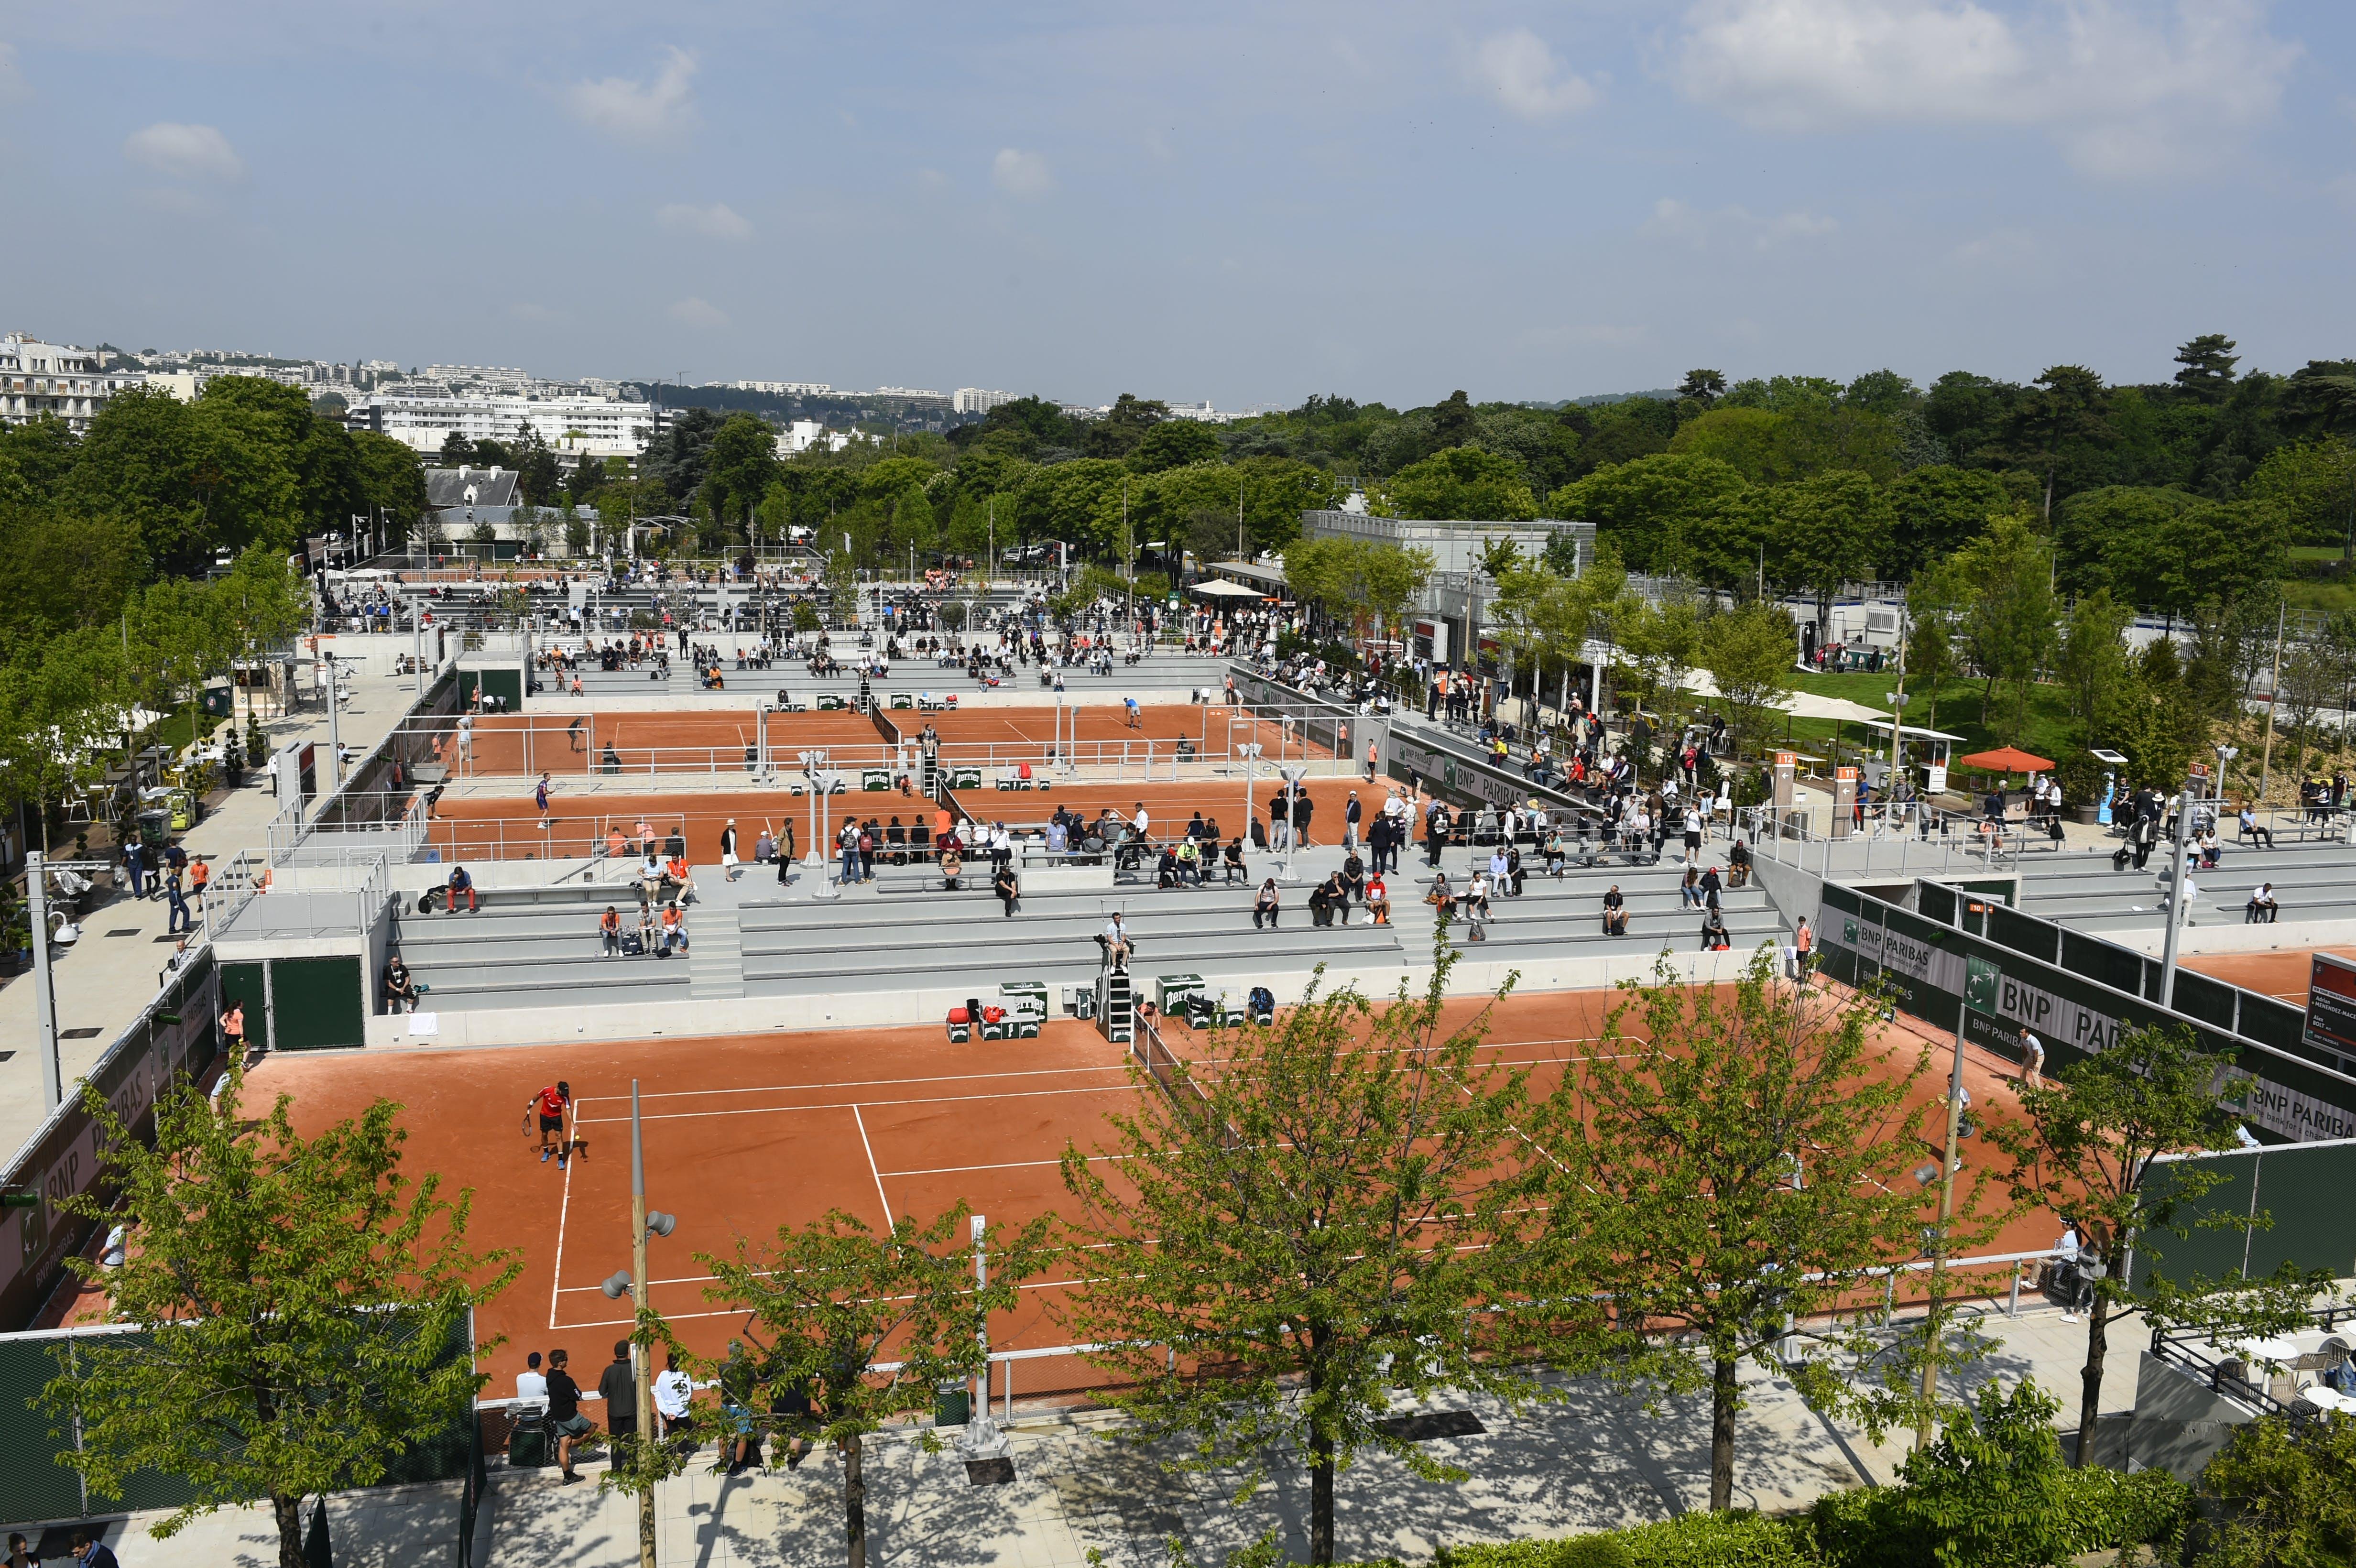 Qualifications Roland-Garros 2019 Fonds des Princes